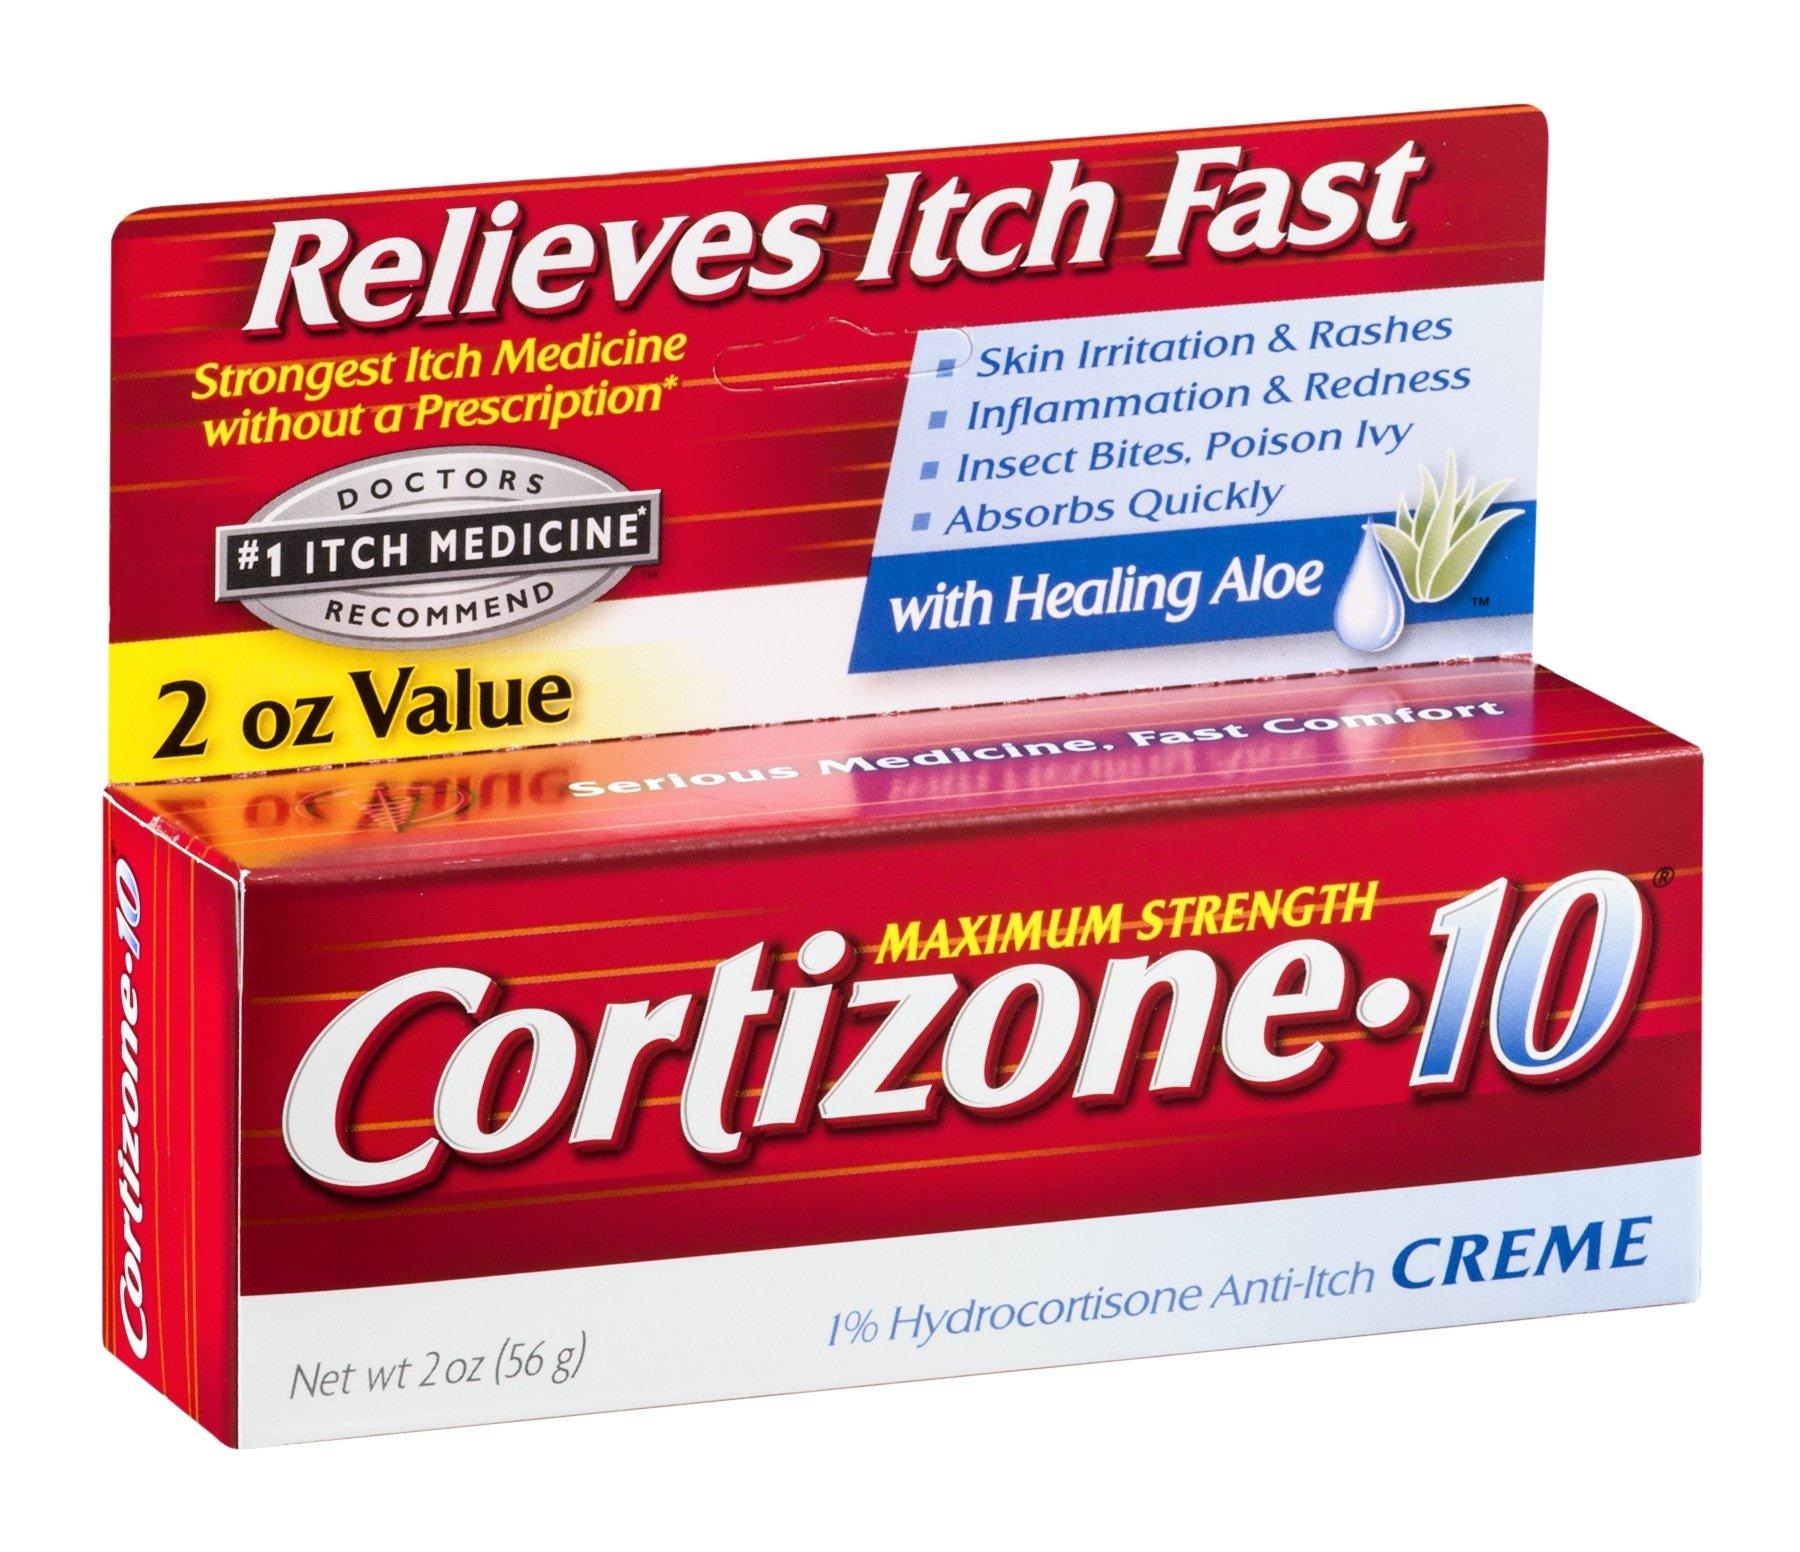 Cortizone Max Strength Creme